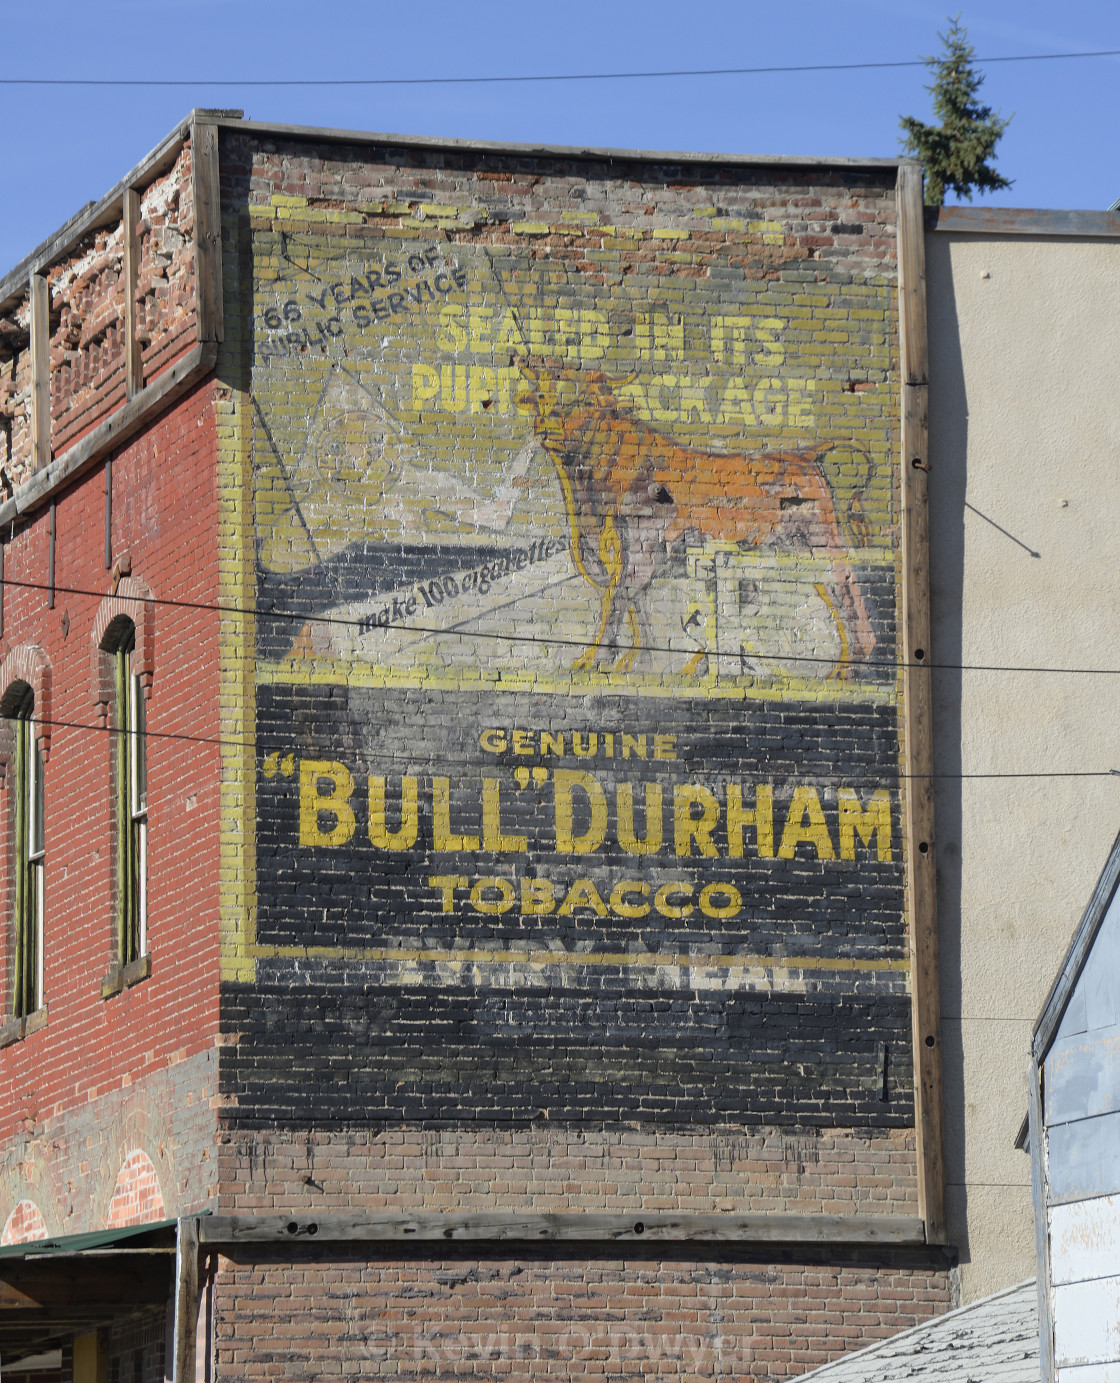 """Bull Durham tobacco"" stock image"